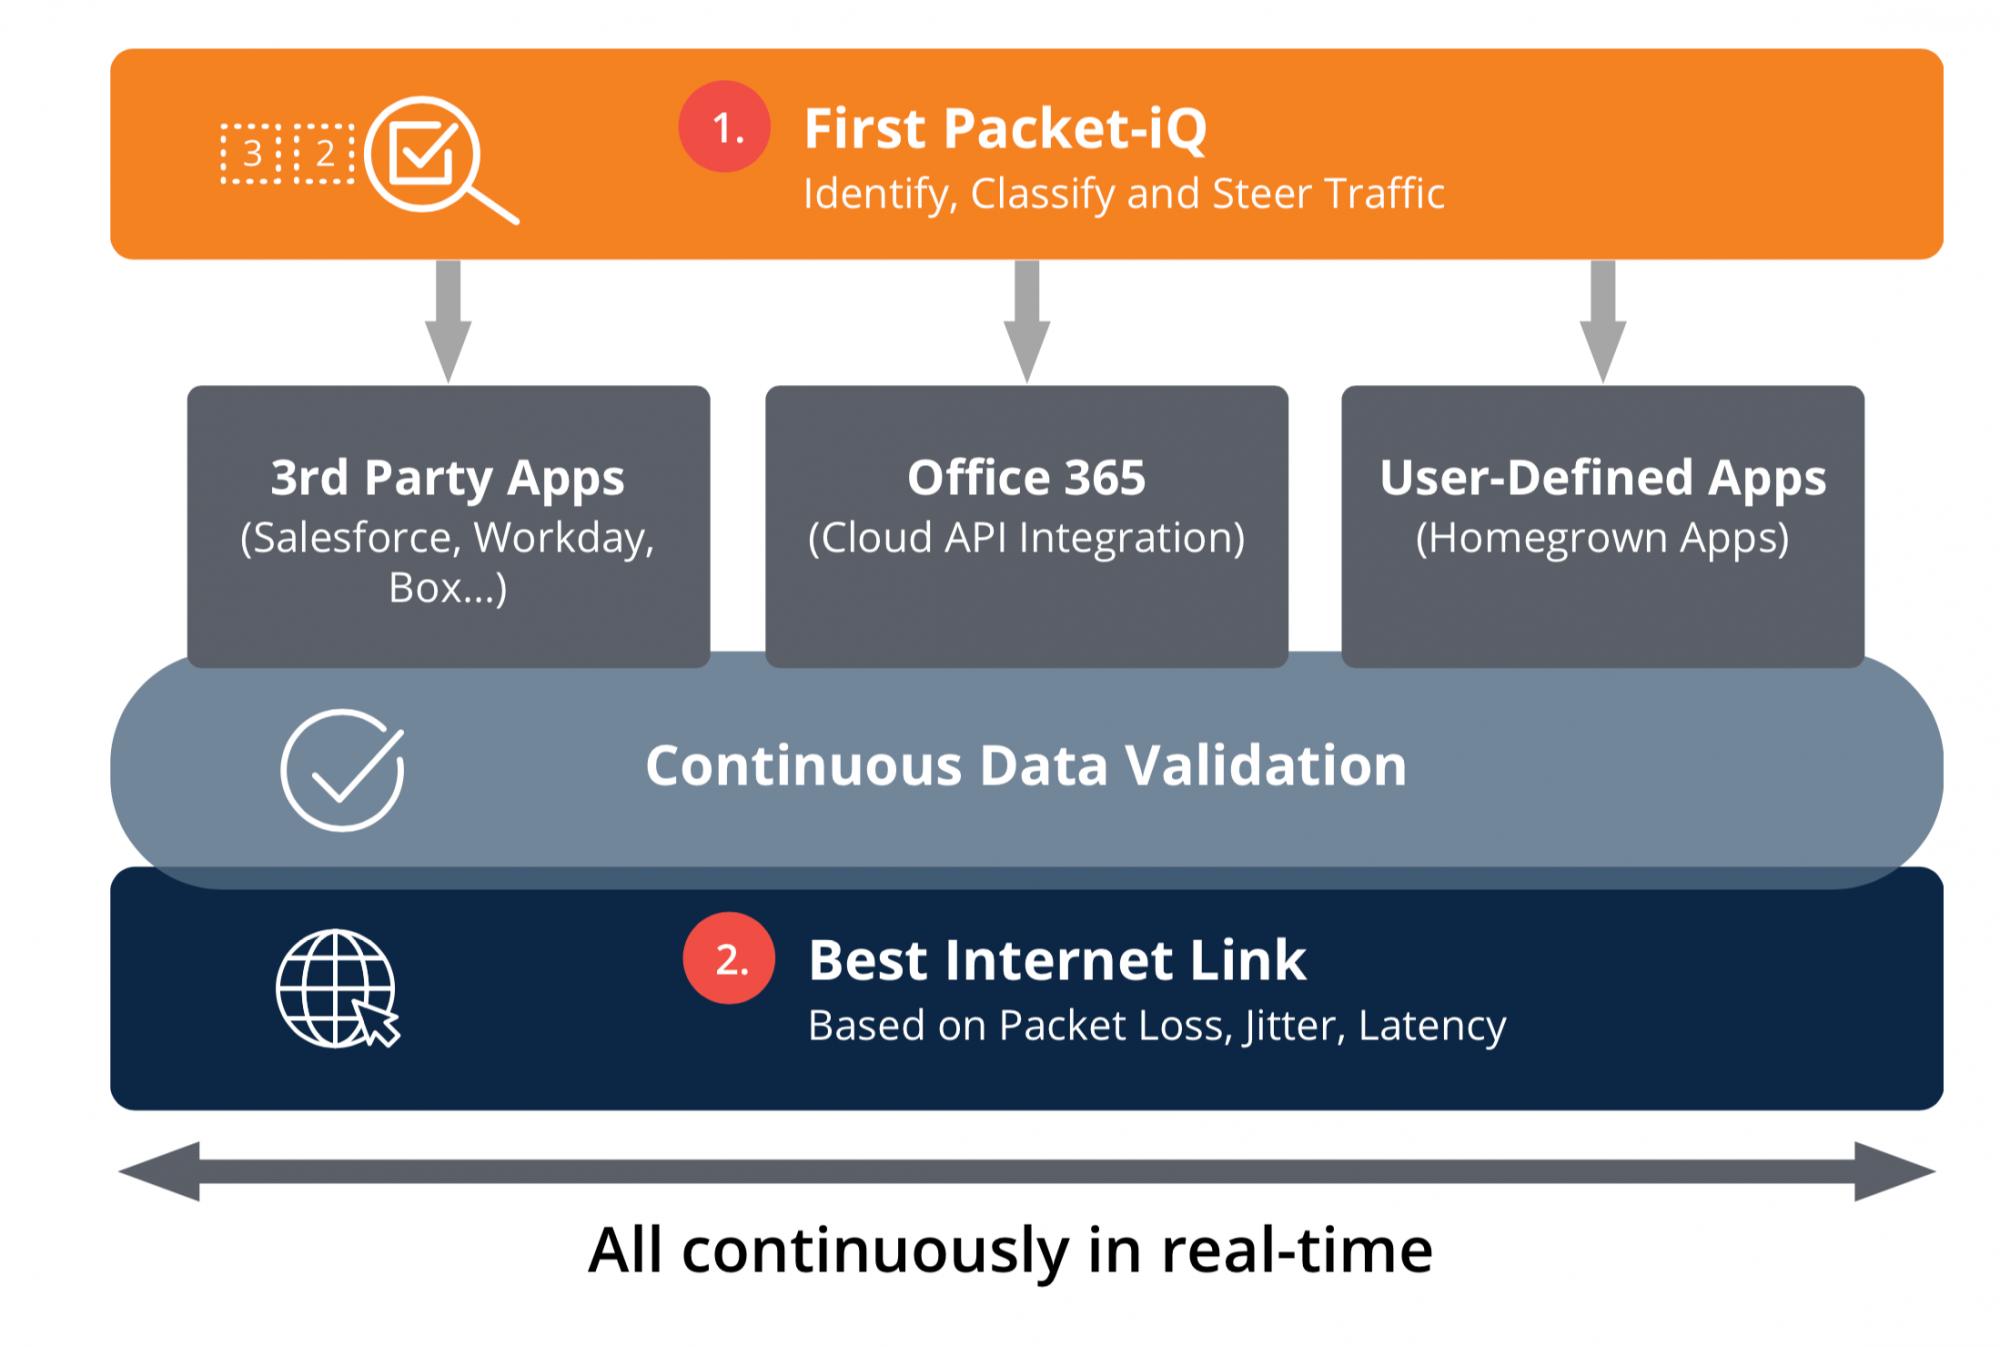 First Packet-iQ